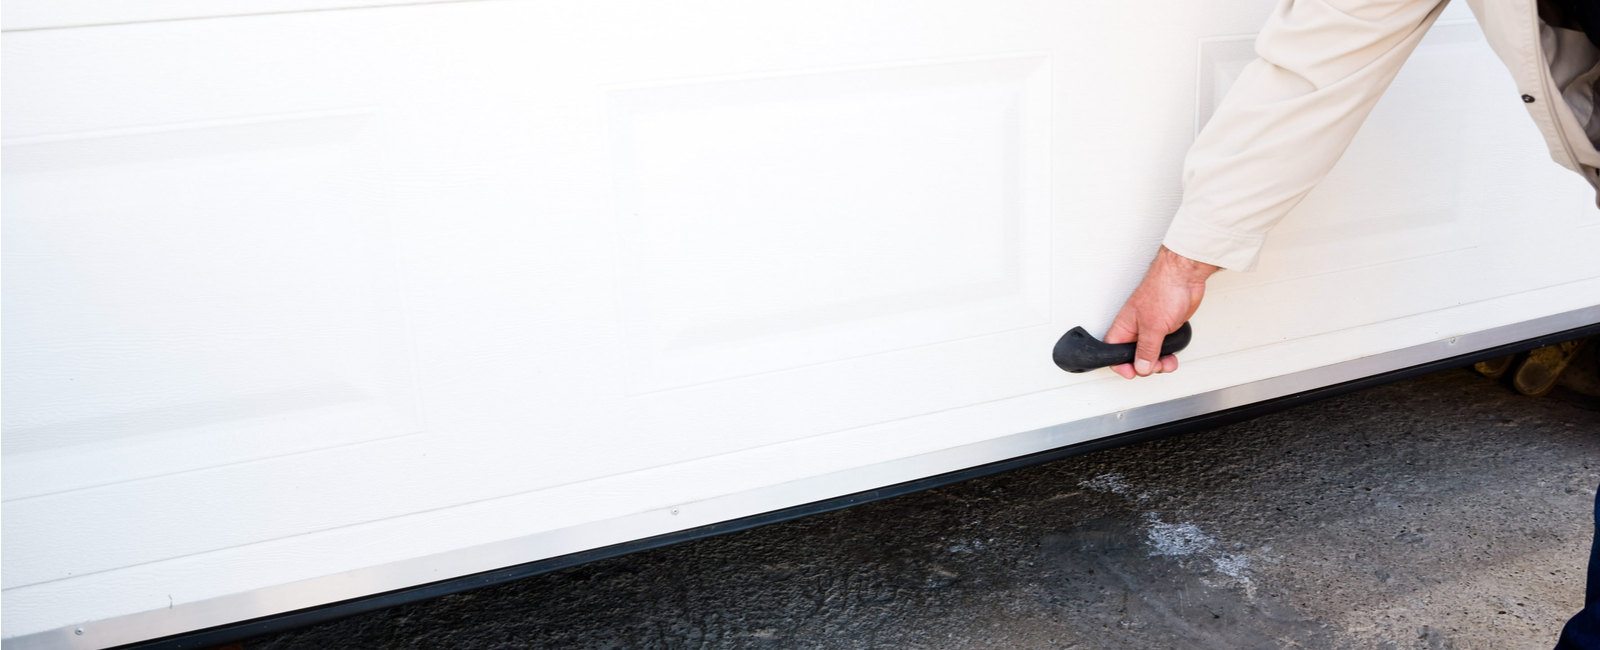 Comment Poser Installer Une Porte De Garage Basculante